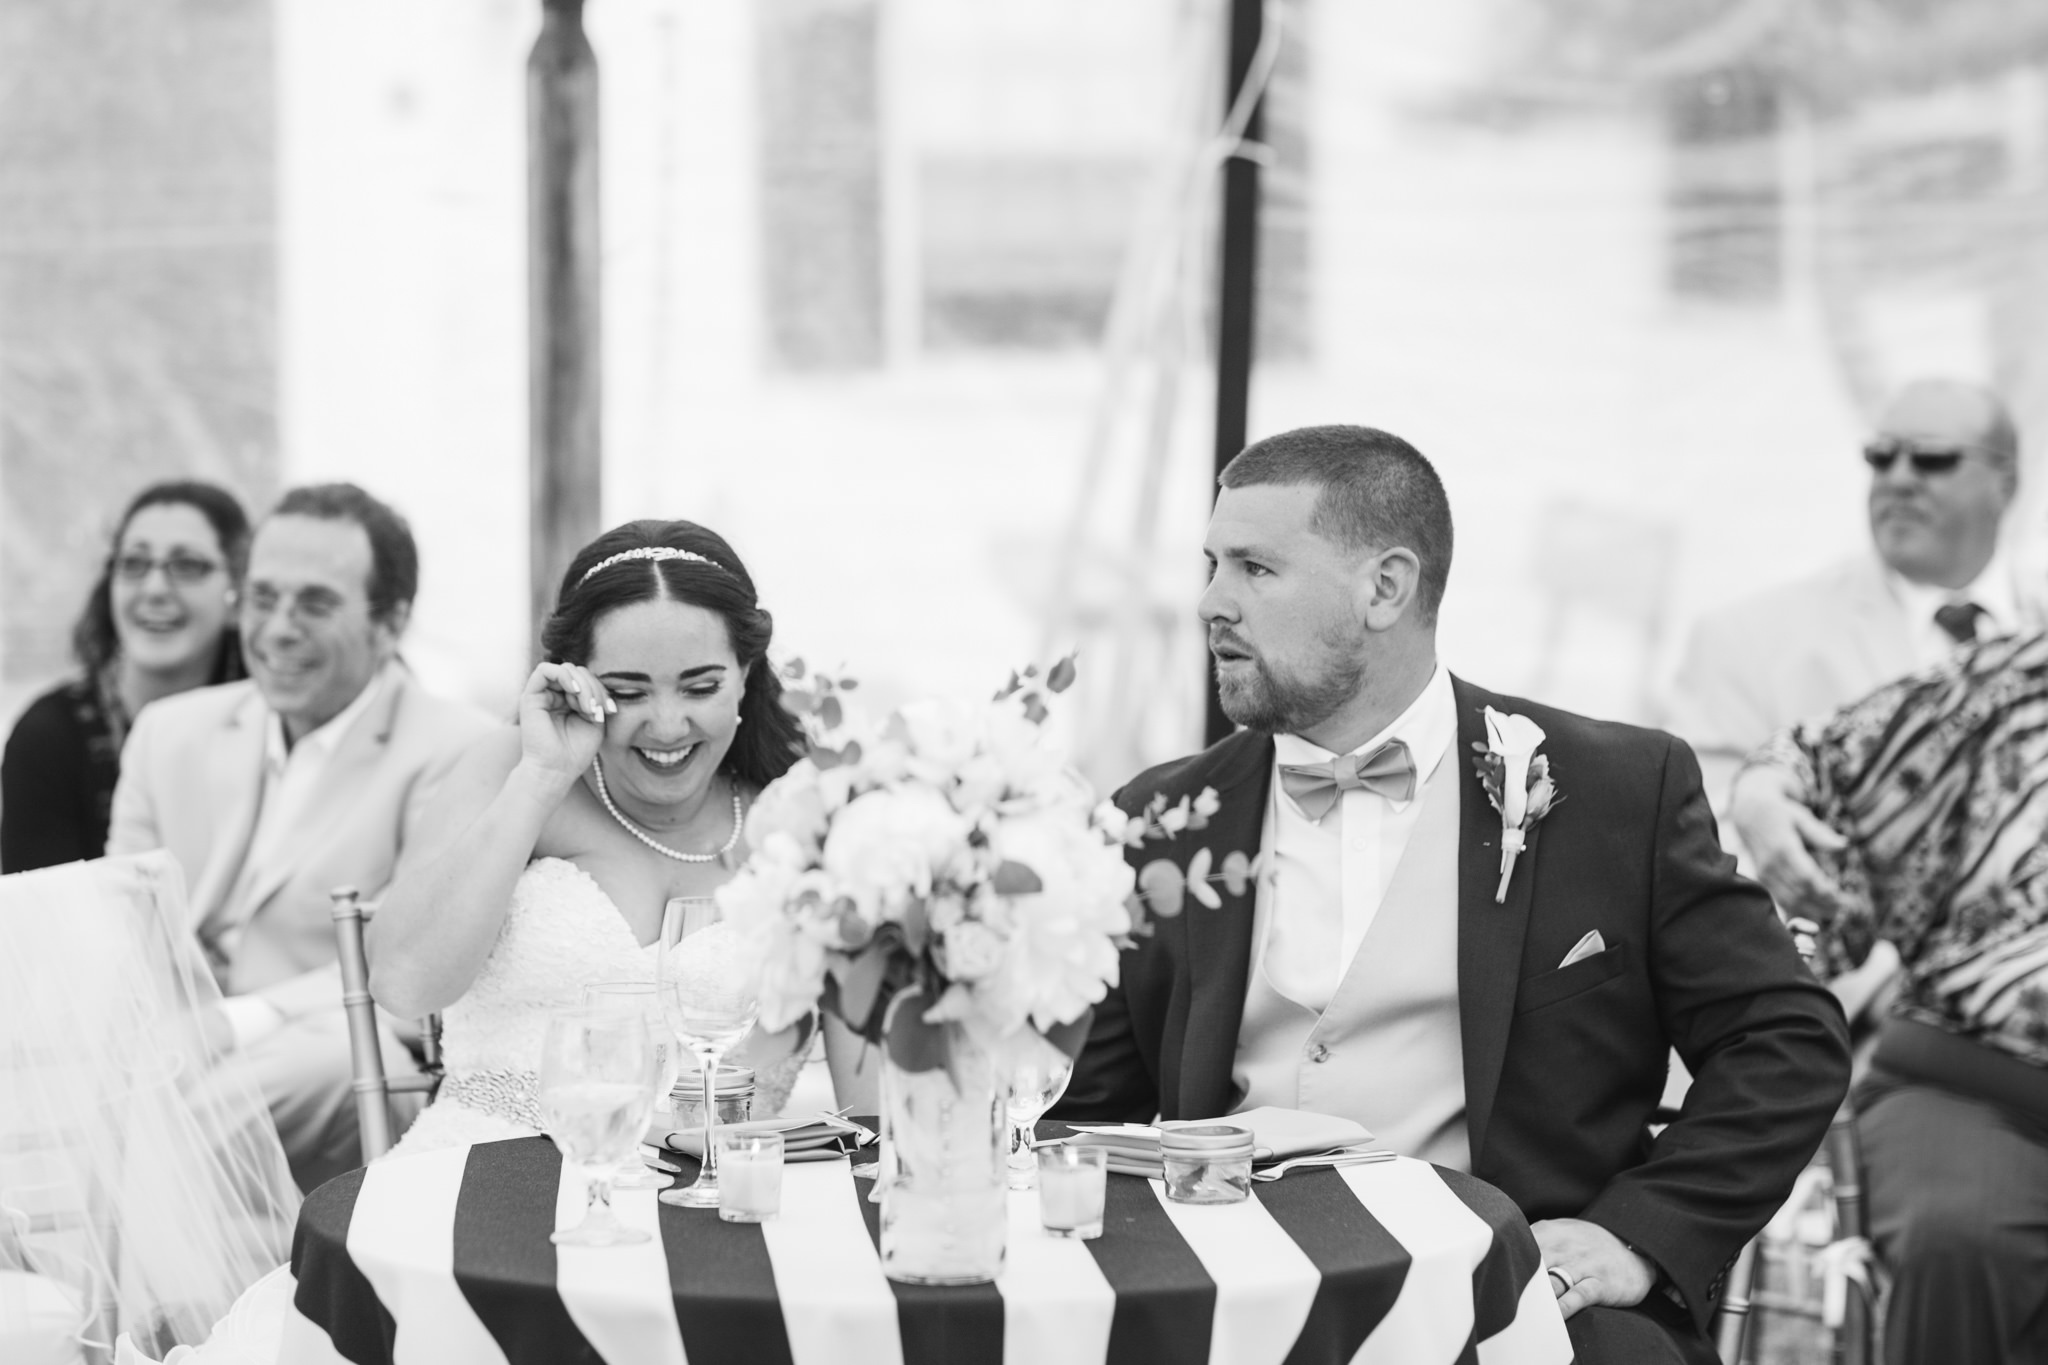 Jillian-rollins-photography-top100-capecodphotographer-maphotographer-wedding-photographer-newport-wedding-10.jpg